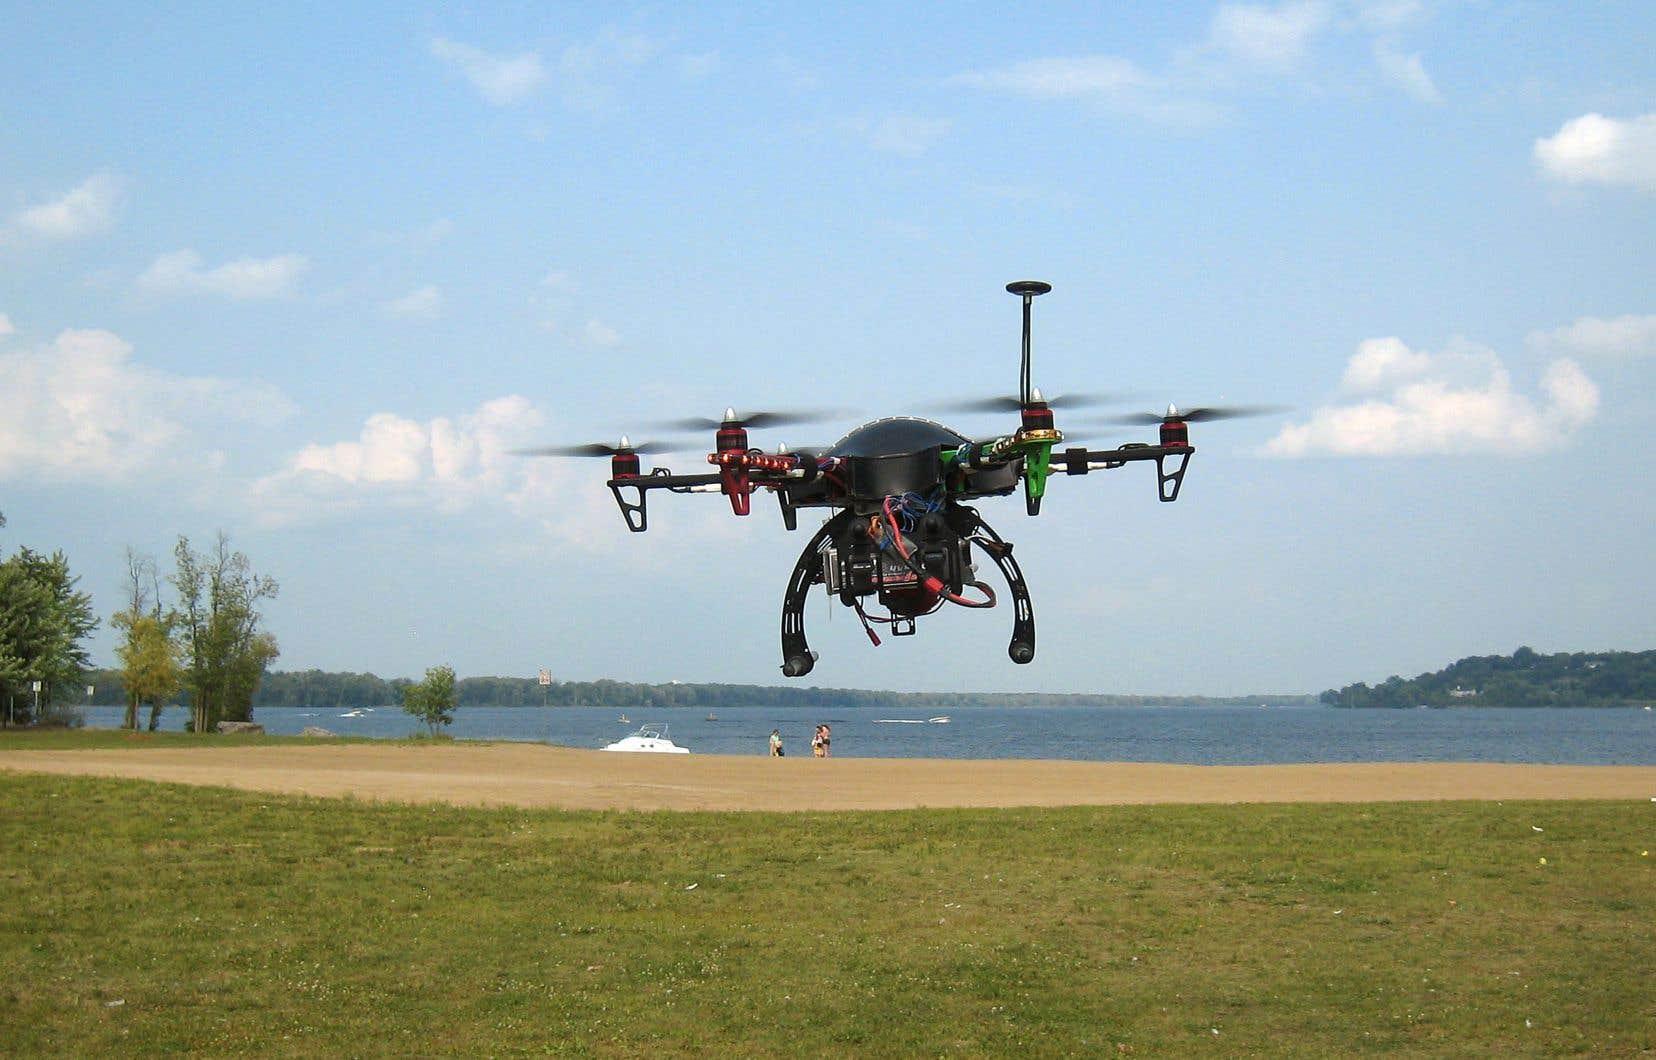 Les règles ciblent les drones de 250 grammes à 25 kilos.